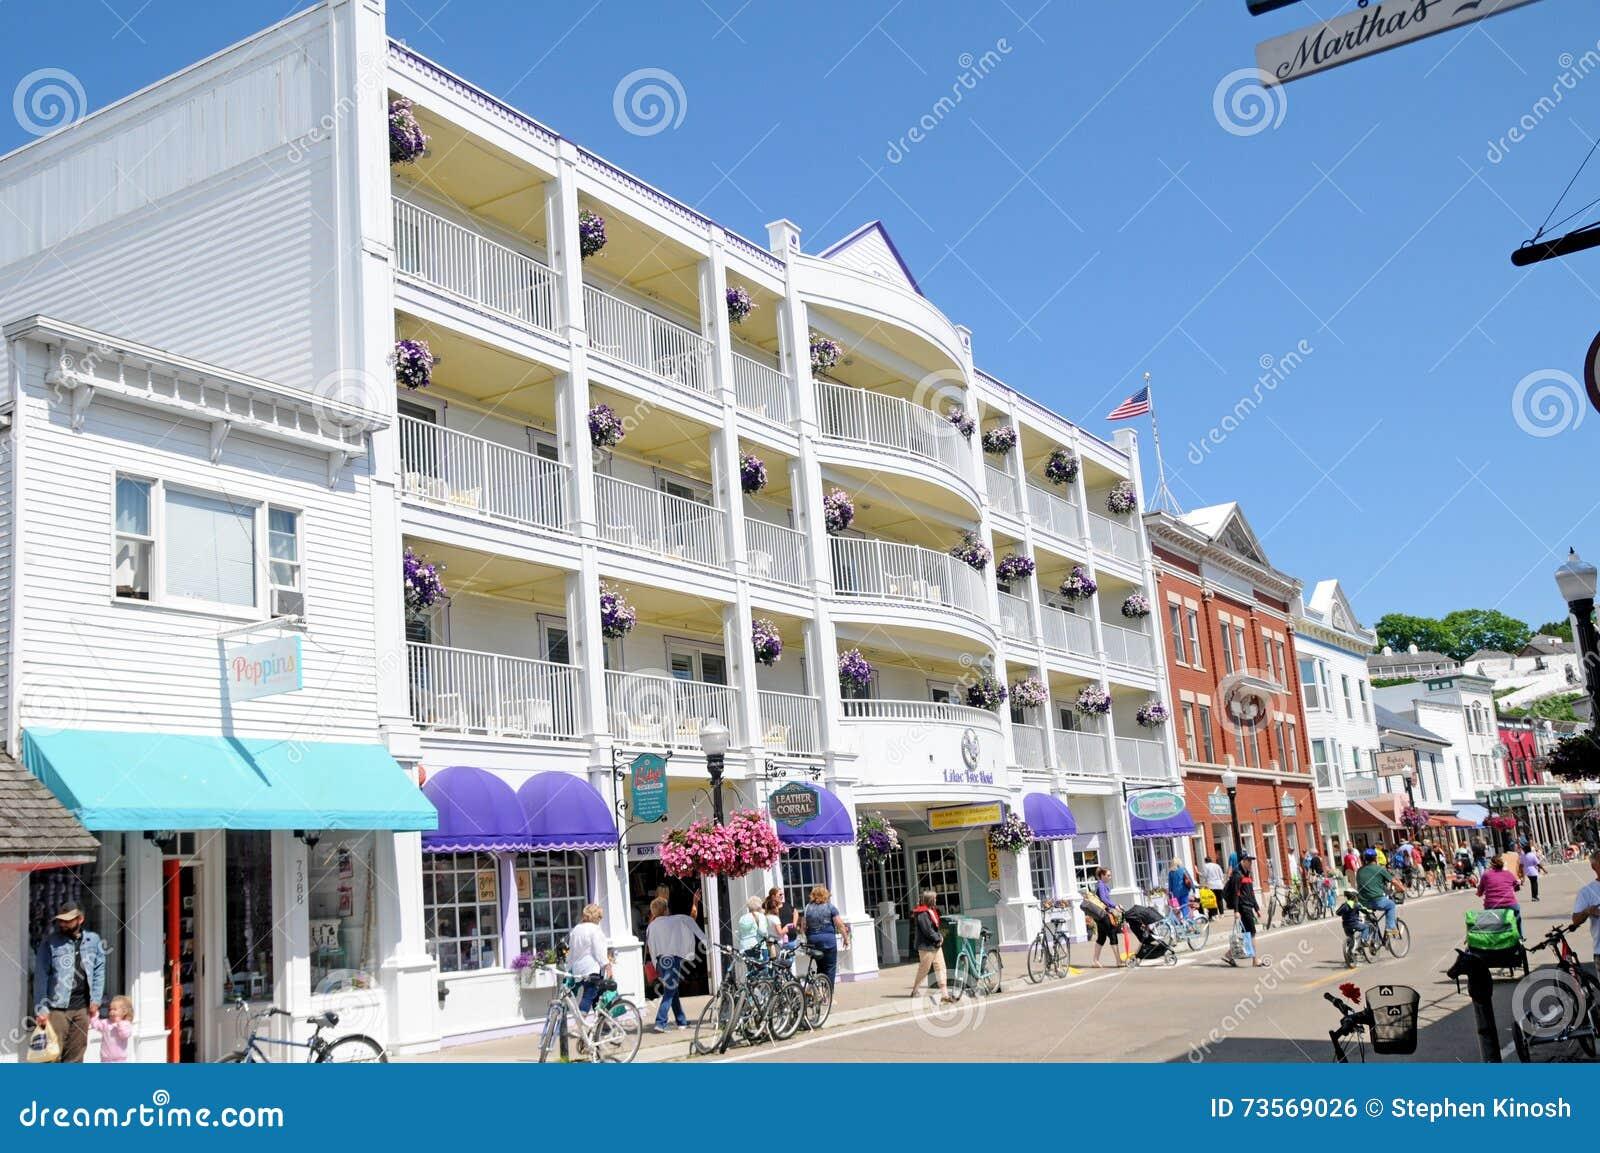 Mackinac Island | Mackinac Island Hotel Deals | Mission Point |Mackinac Island Bicycle Cafe